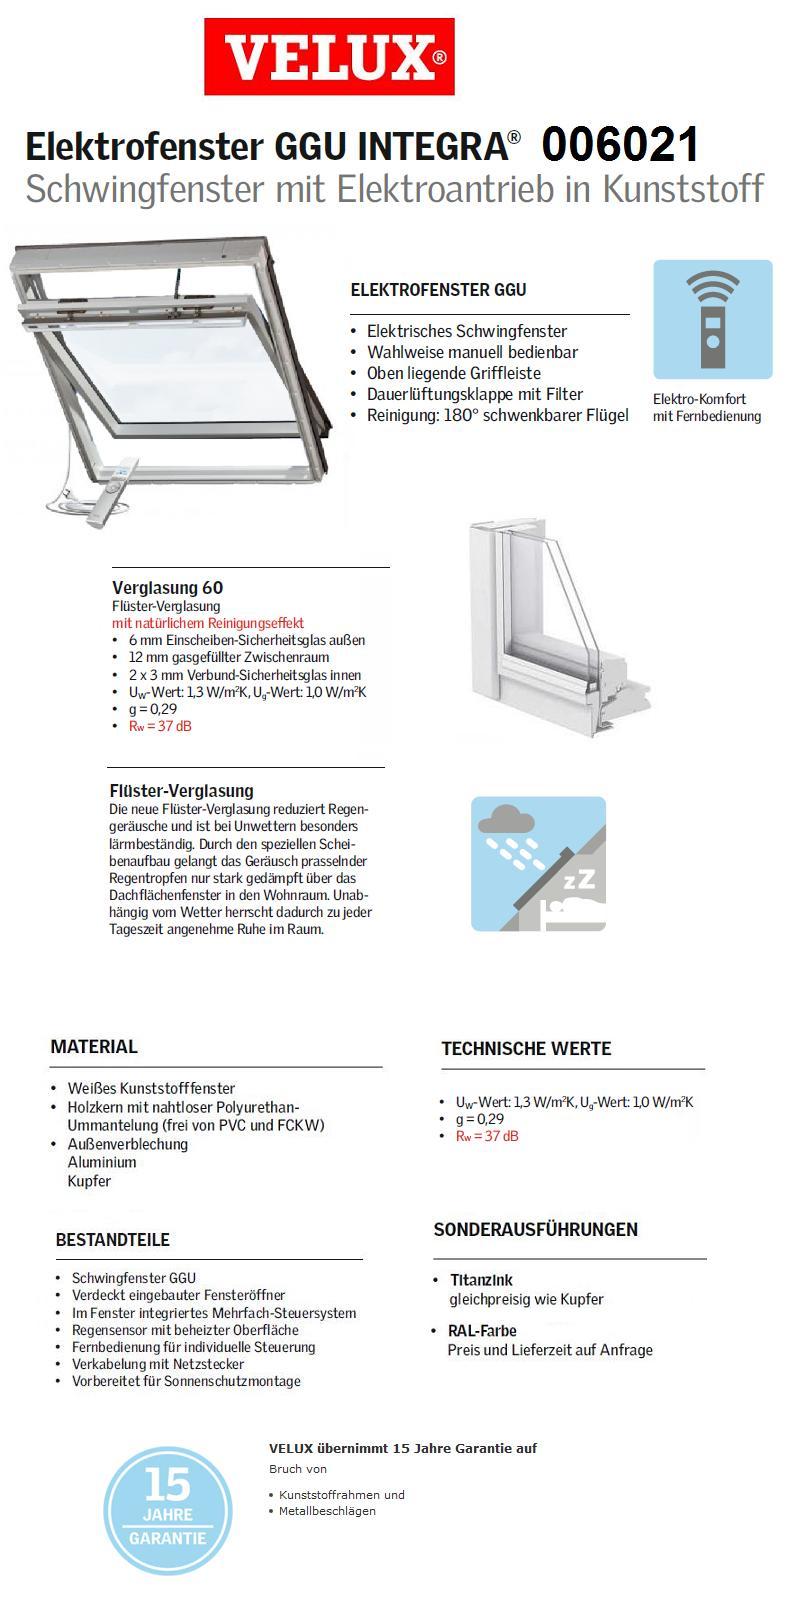 ggu p10 0060 21 94x160 cm integra dachmax. Black Bedroom Furniture Sets. Home Design Ideas